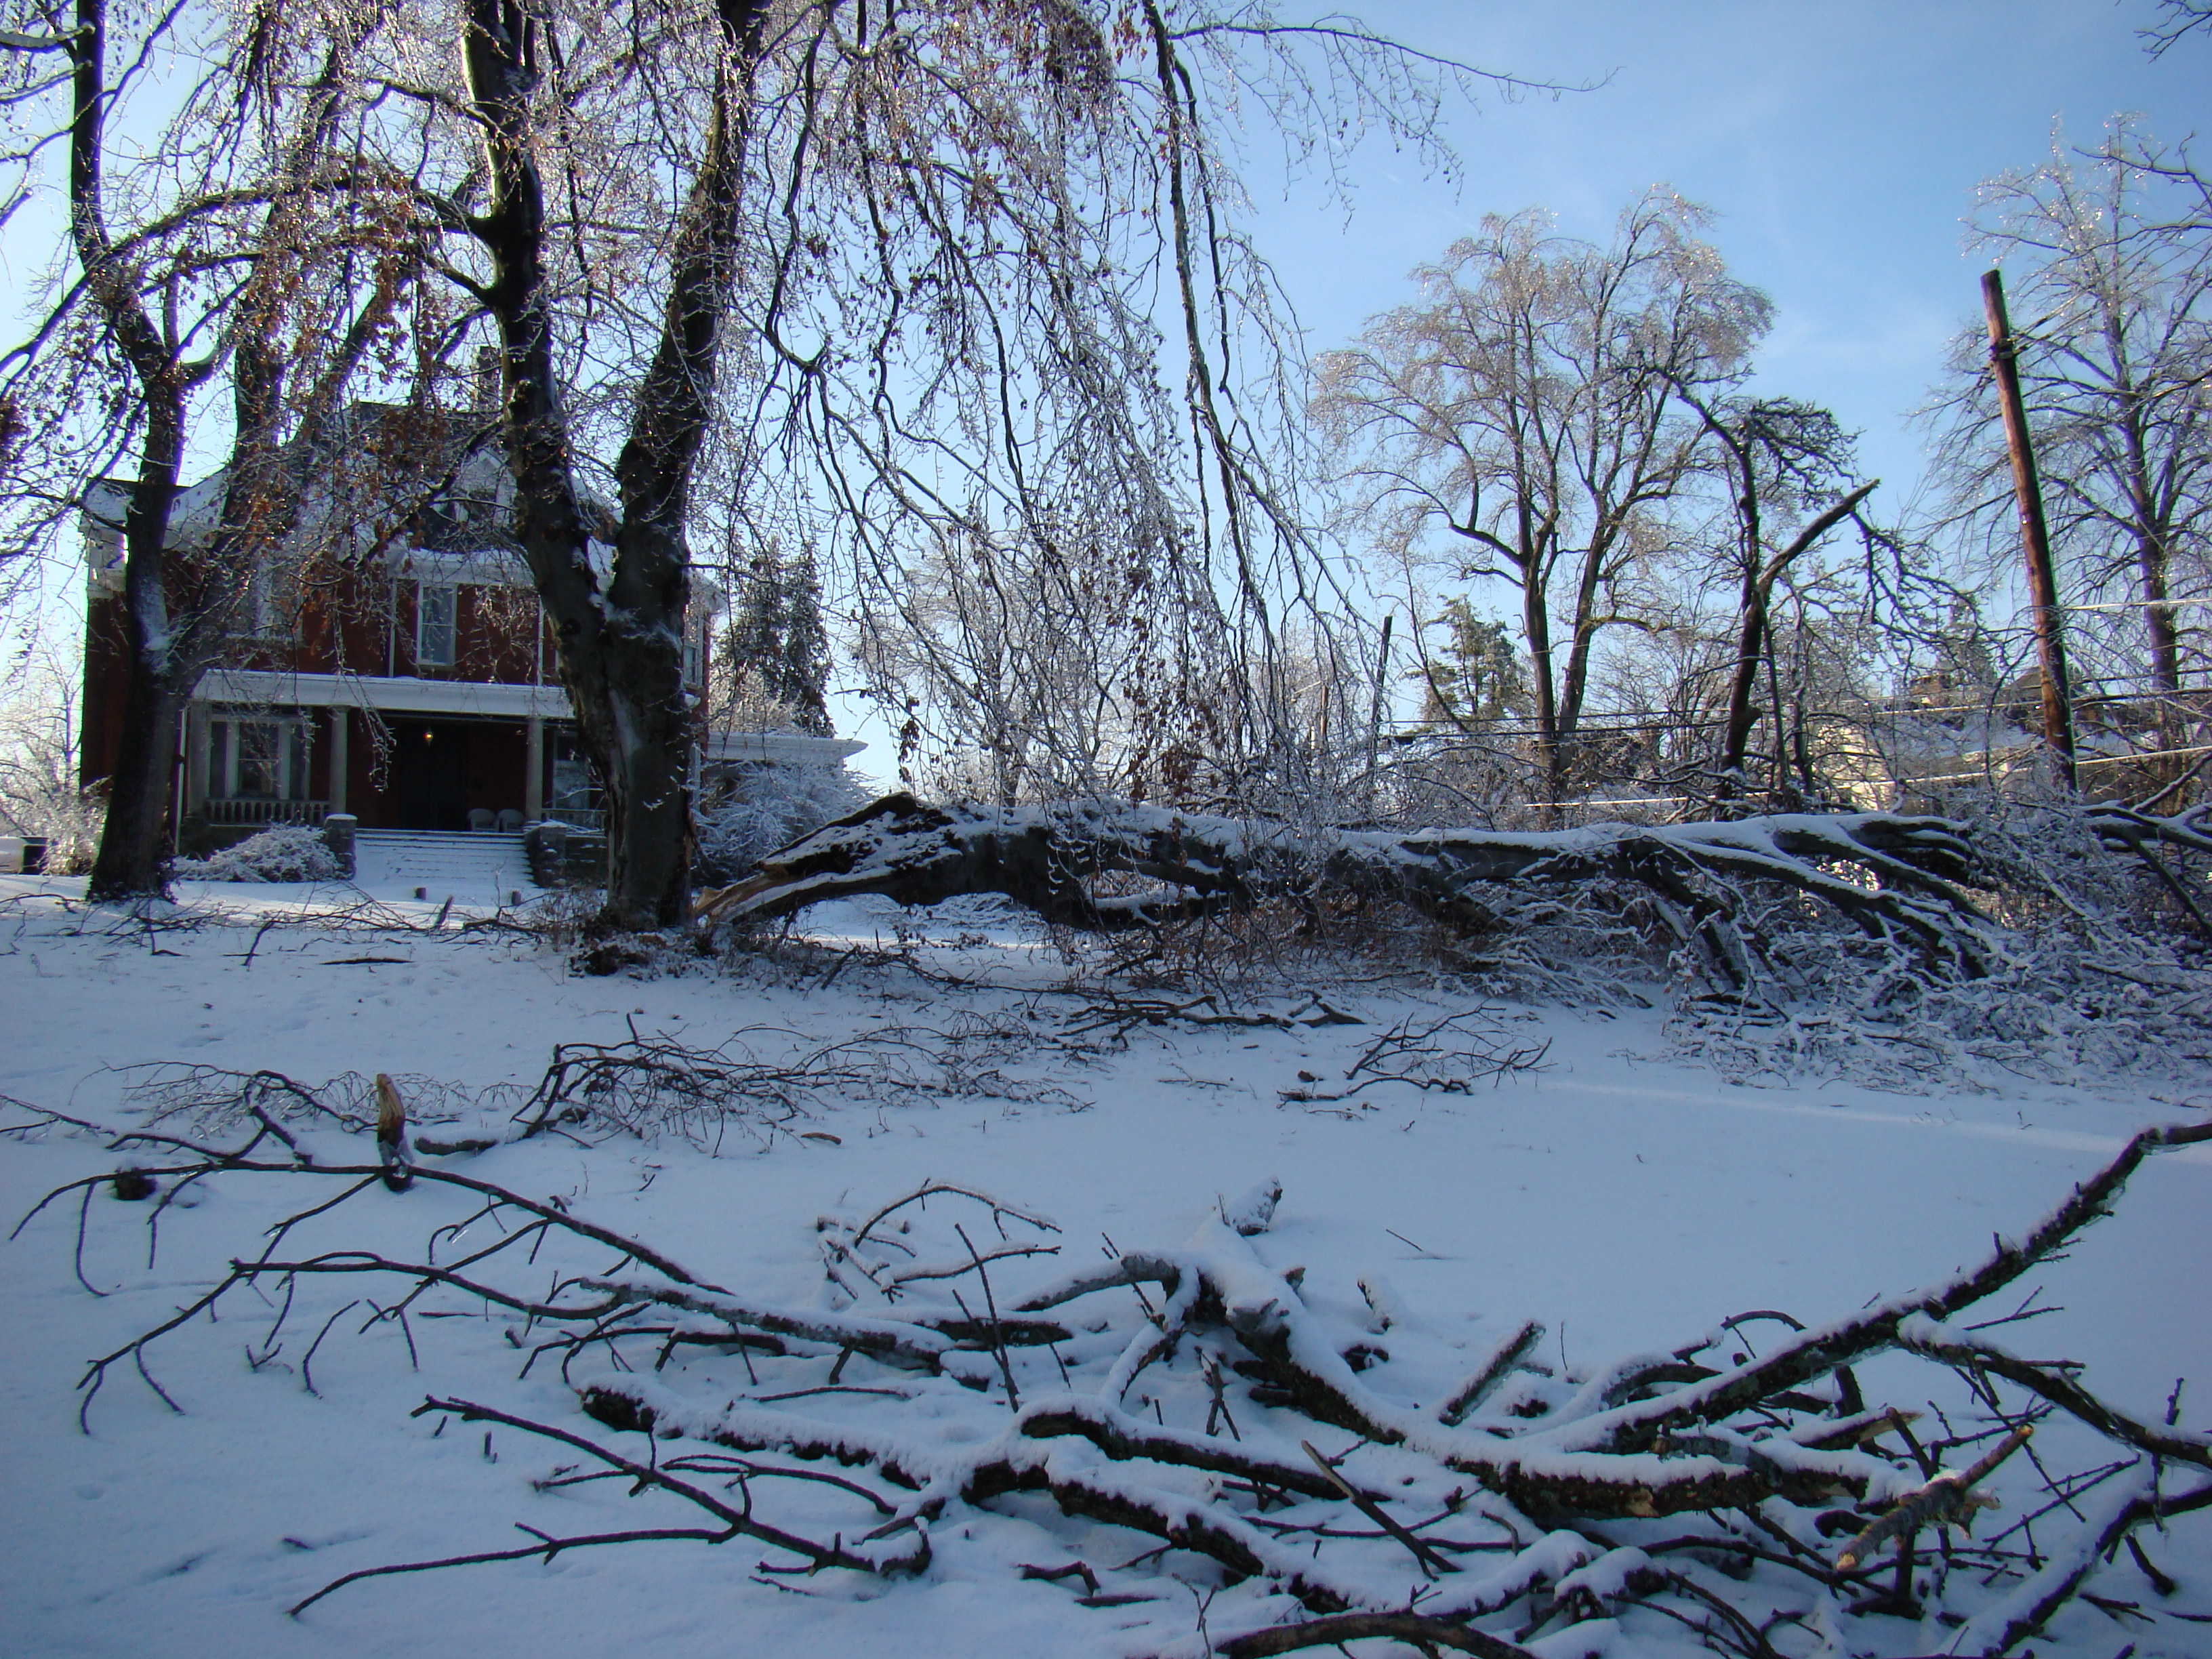 File:2009 winter storm damage; South Broadway Street ...